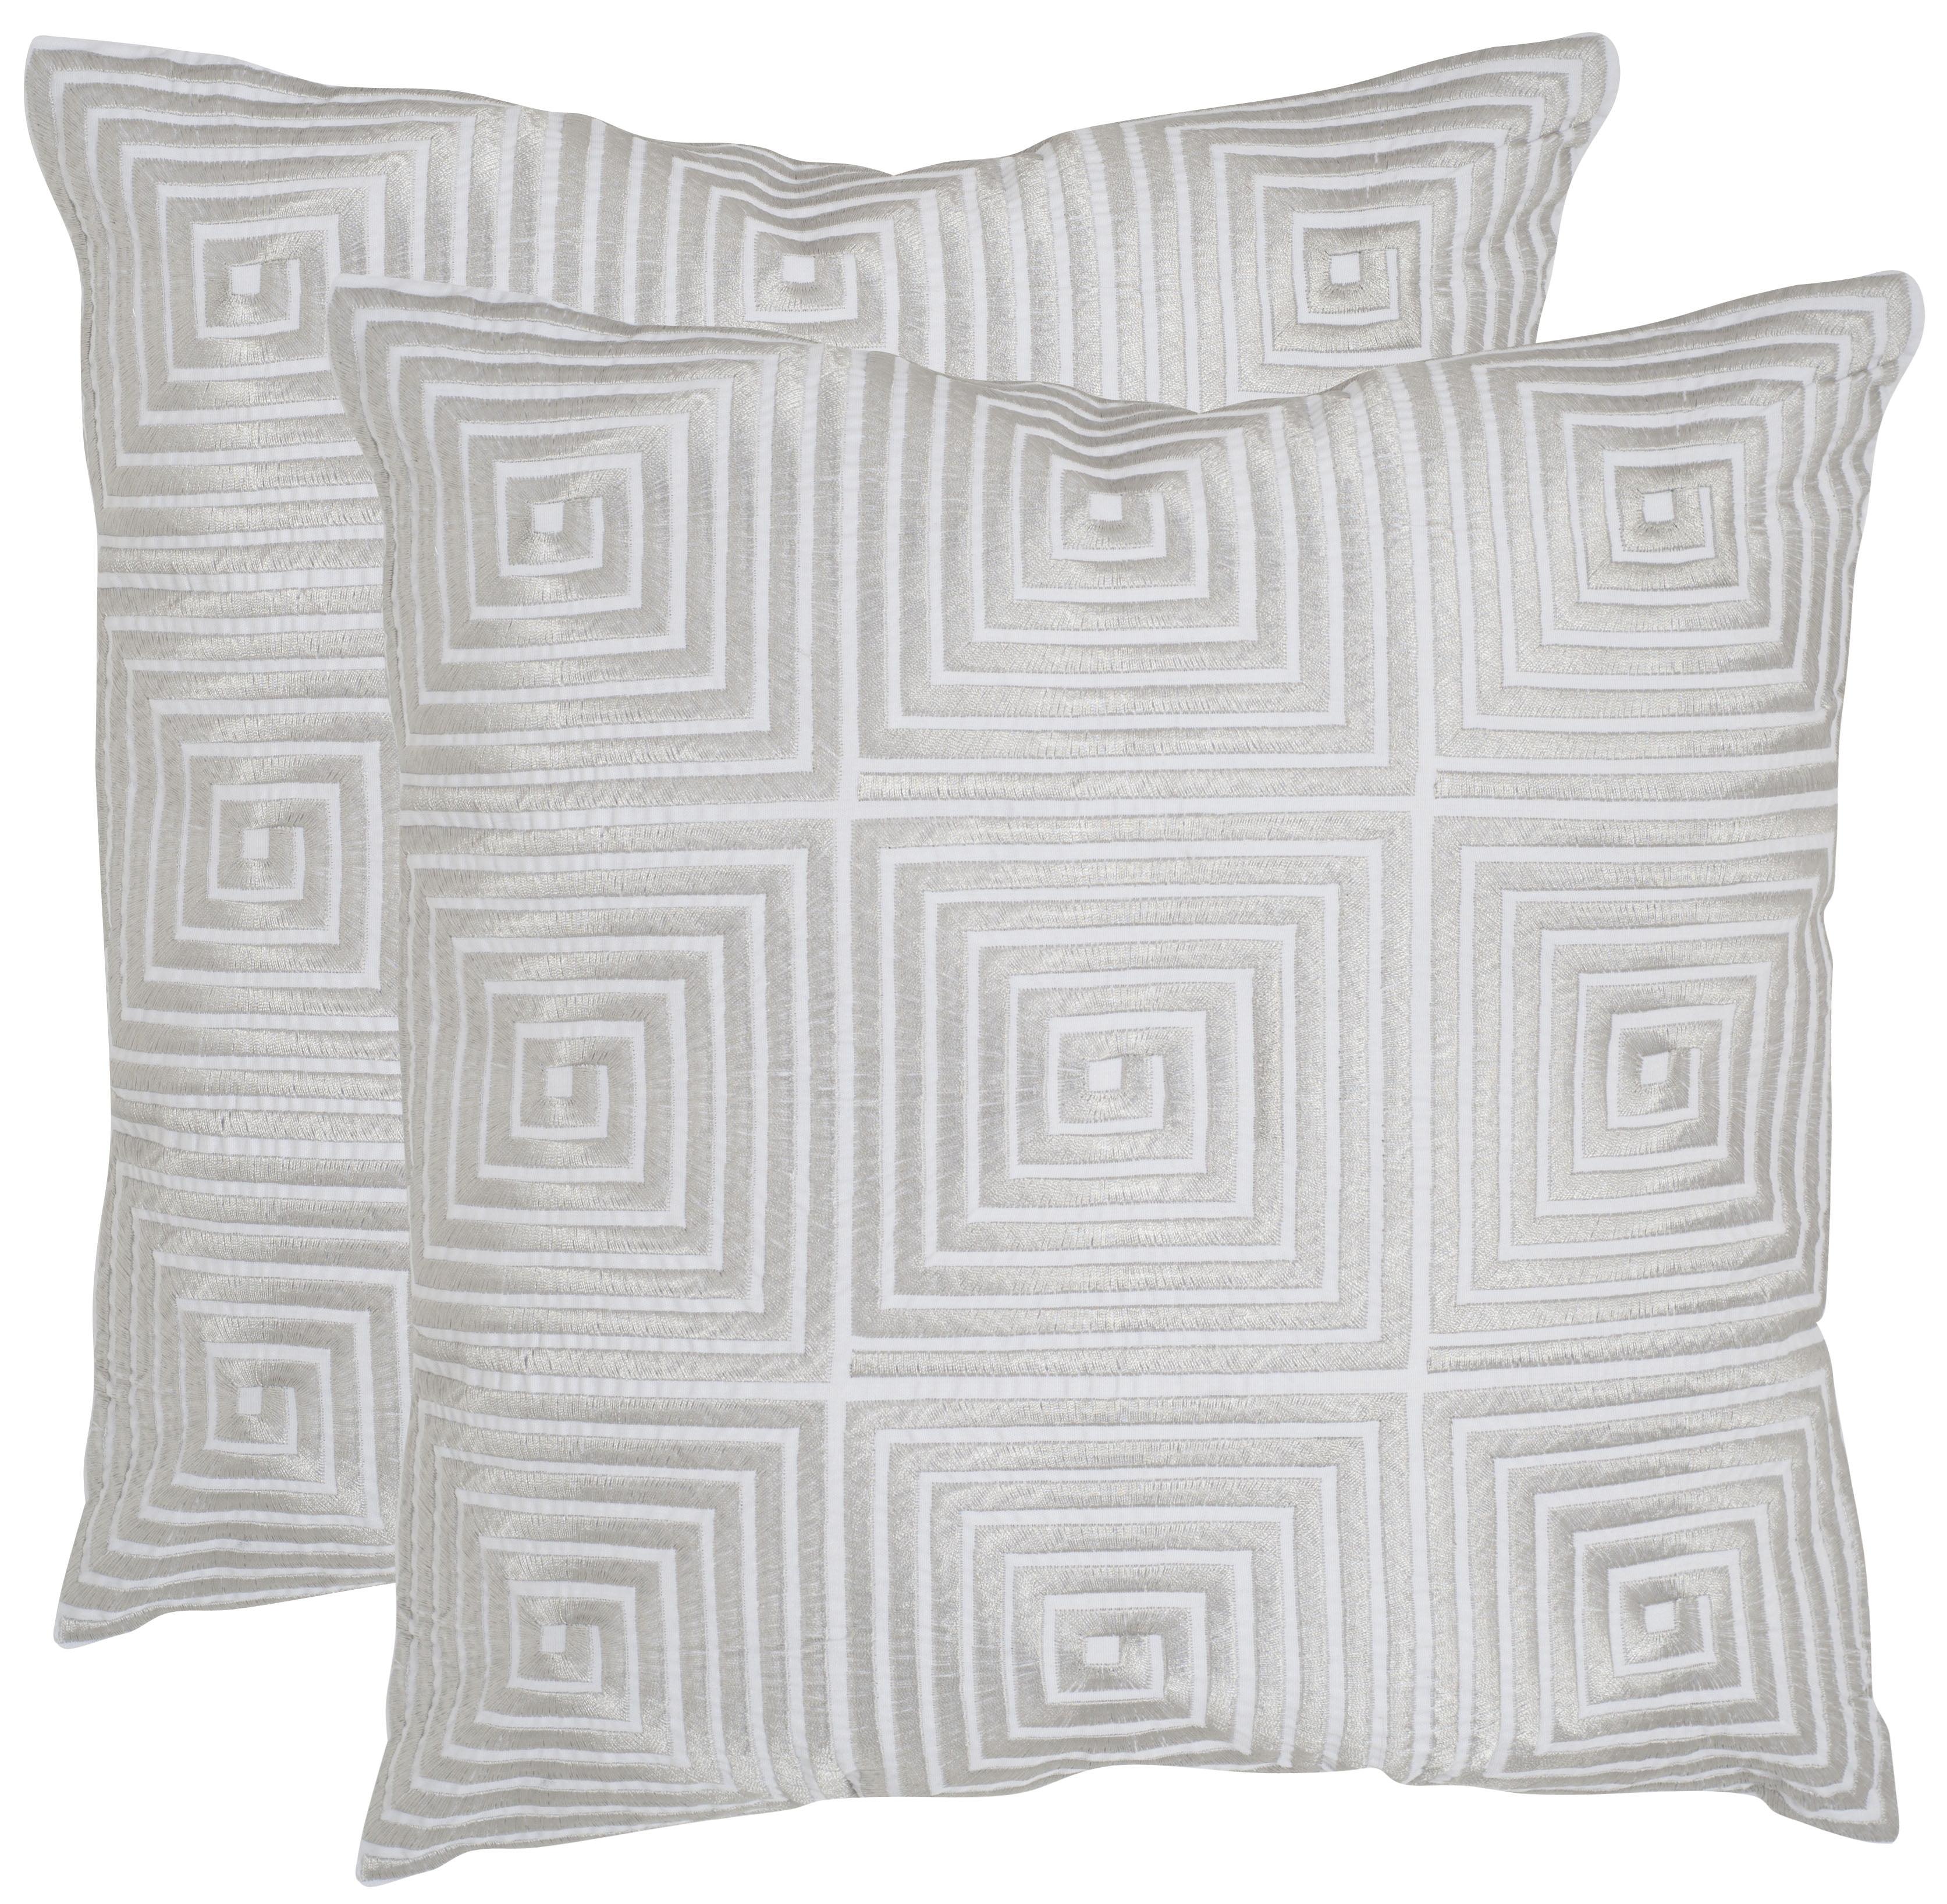 Safavieh Lacie Geometric Pillow, Set of 2